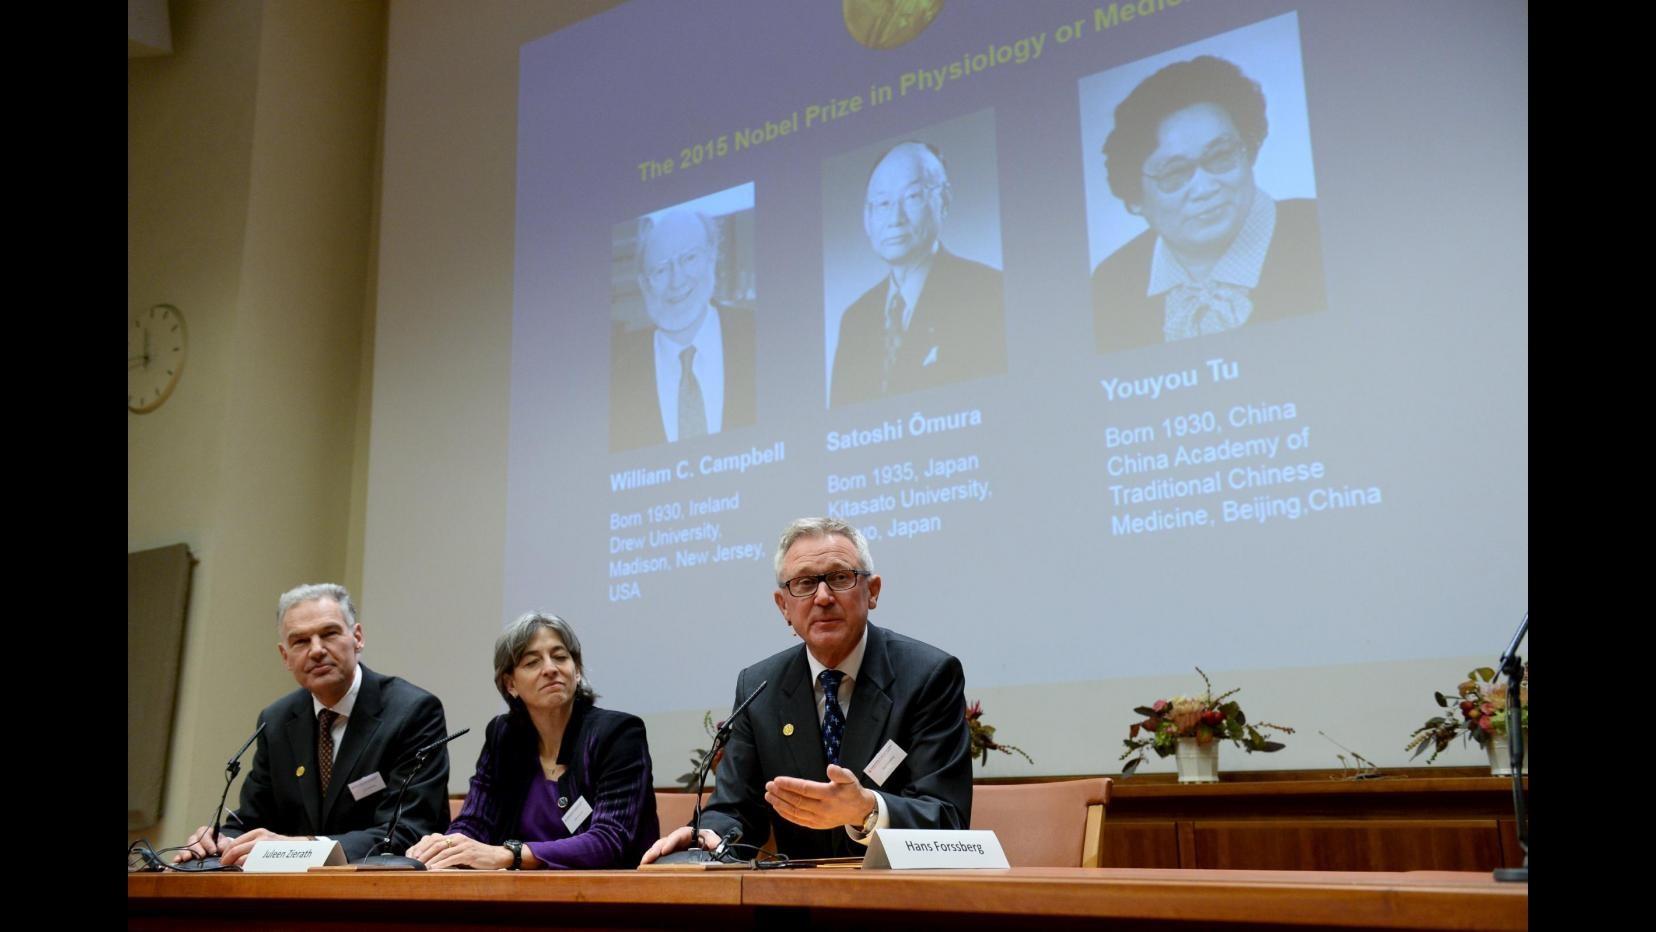 Il Nobel per la Medicina a Campbell, Omura e Tu per studi e cure contro la malaria